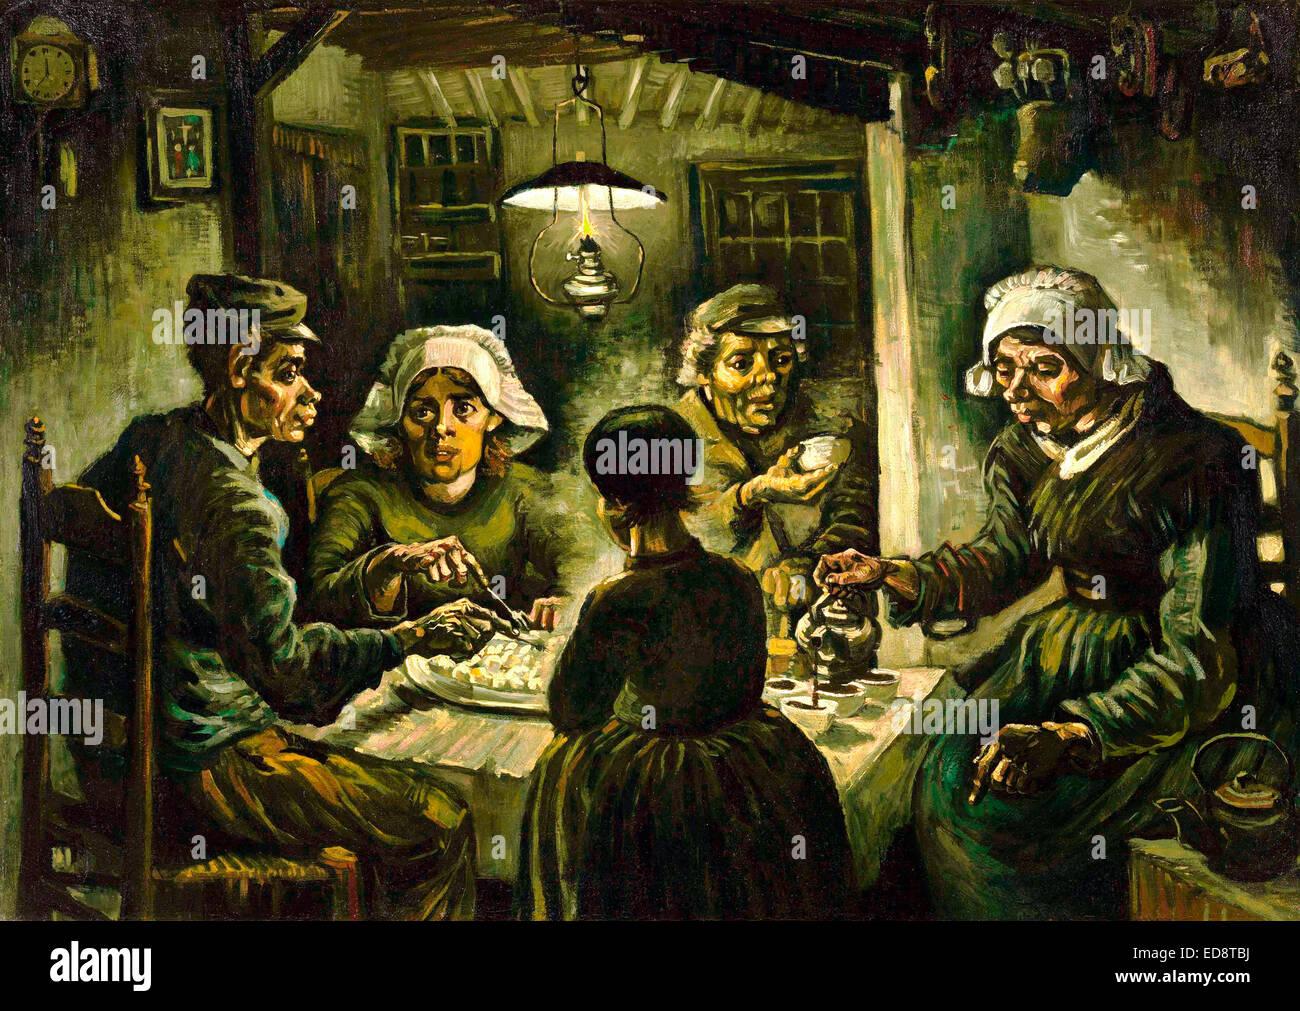 Vincent van gogh the potato eaters 1885 realism oil on canvas stock photo 77026758 alamy - Van gogh comedores de patatas ...